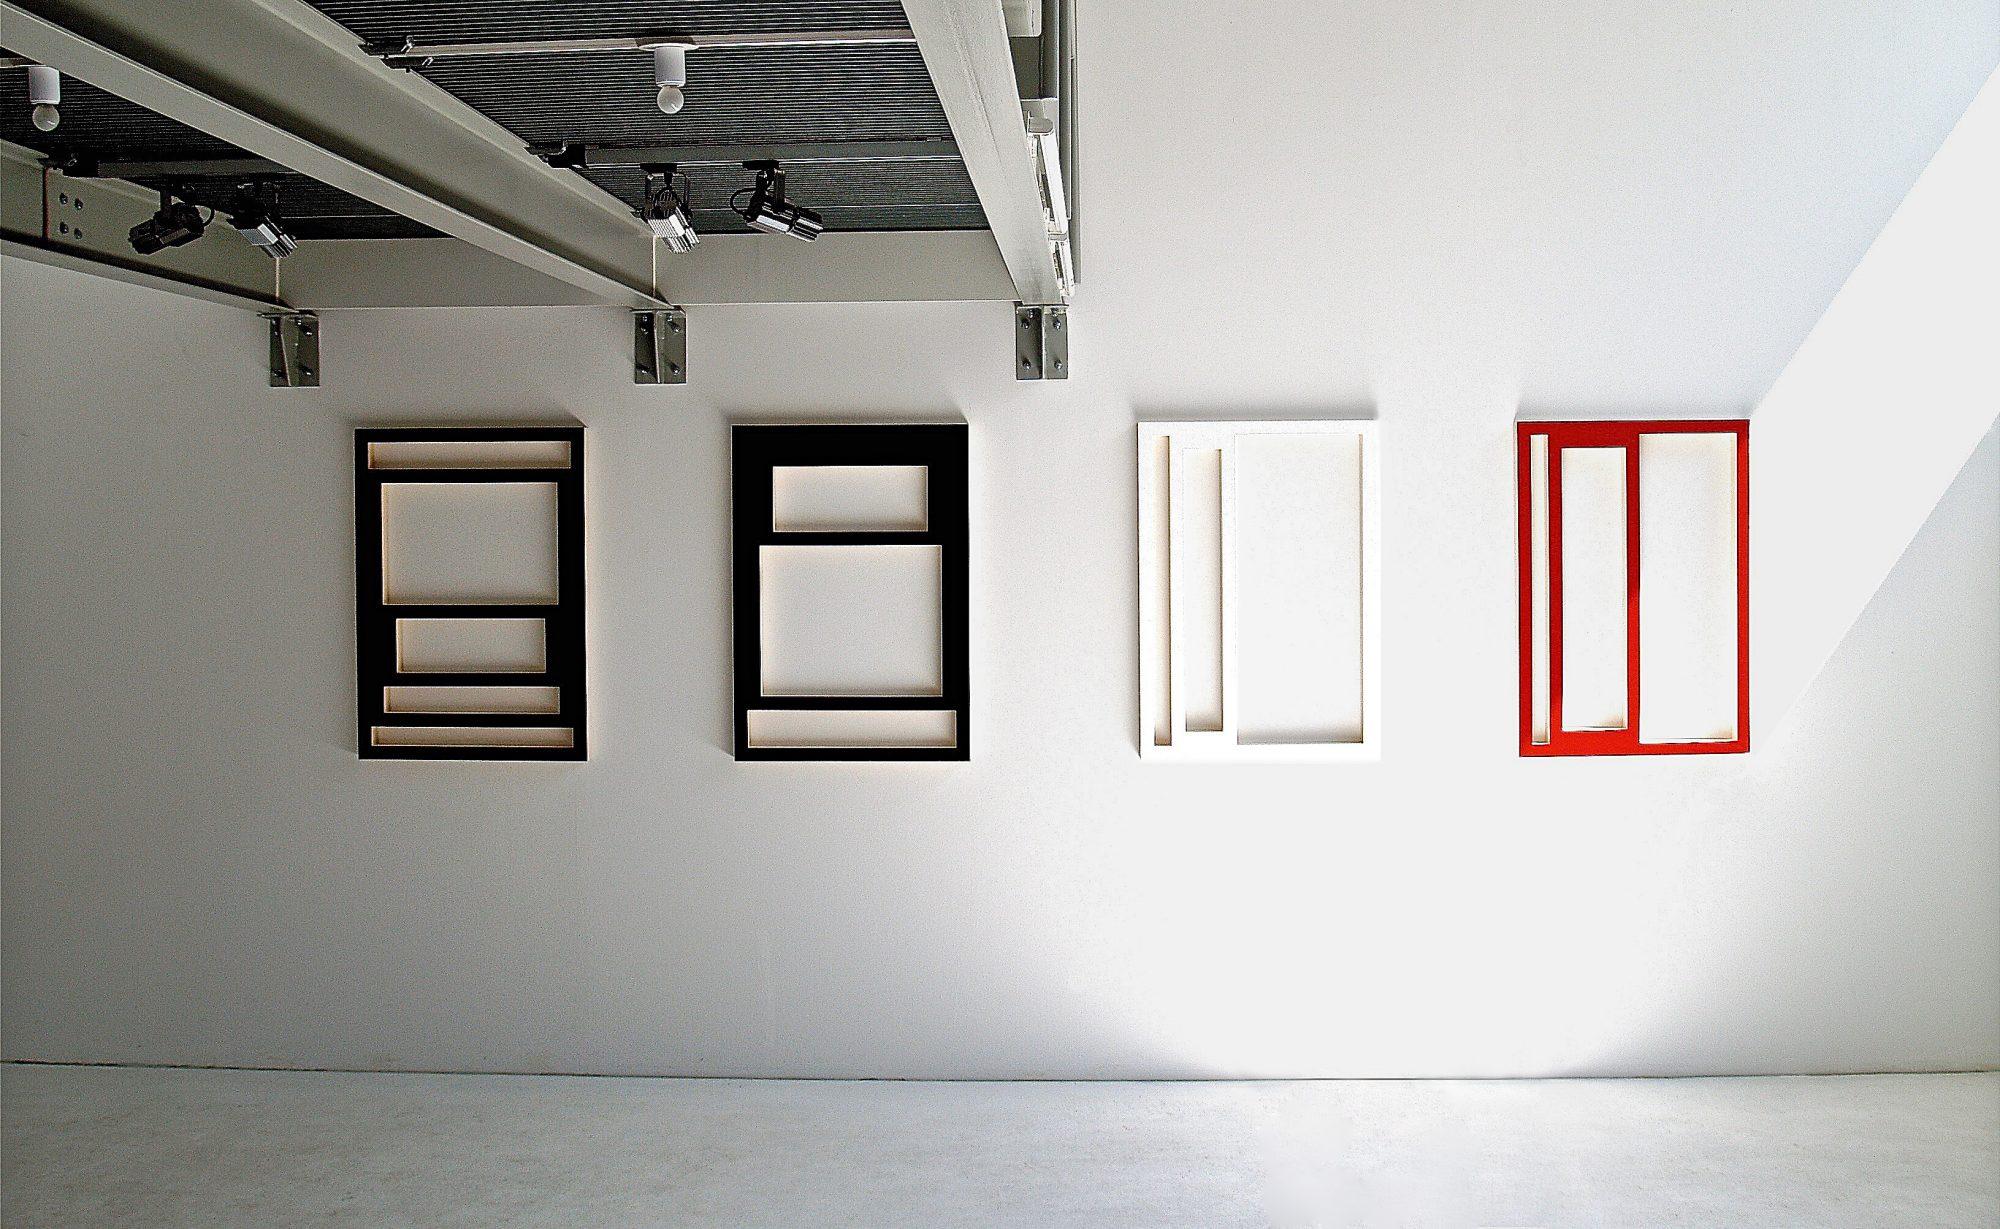 Rahmen / Frames, 2003, Sperrholz, Acryl / plywood, acrylics;je / each 98x69cm